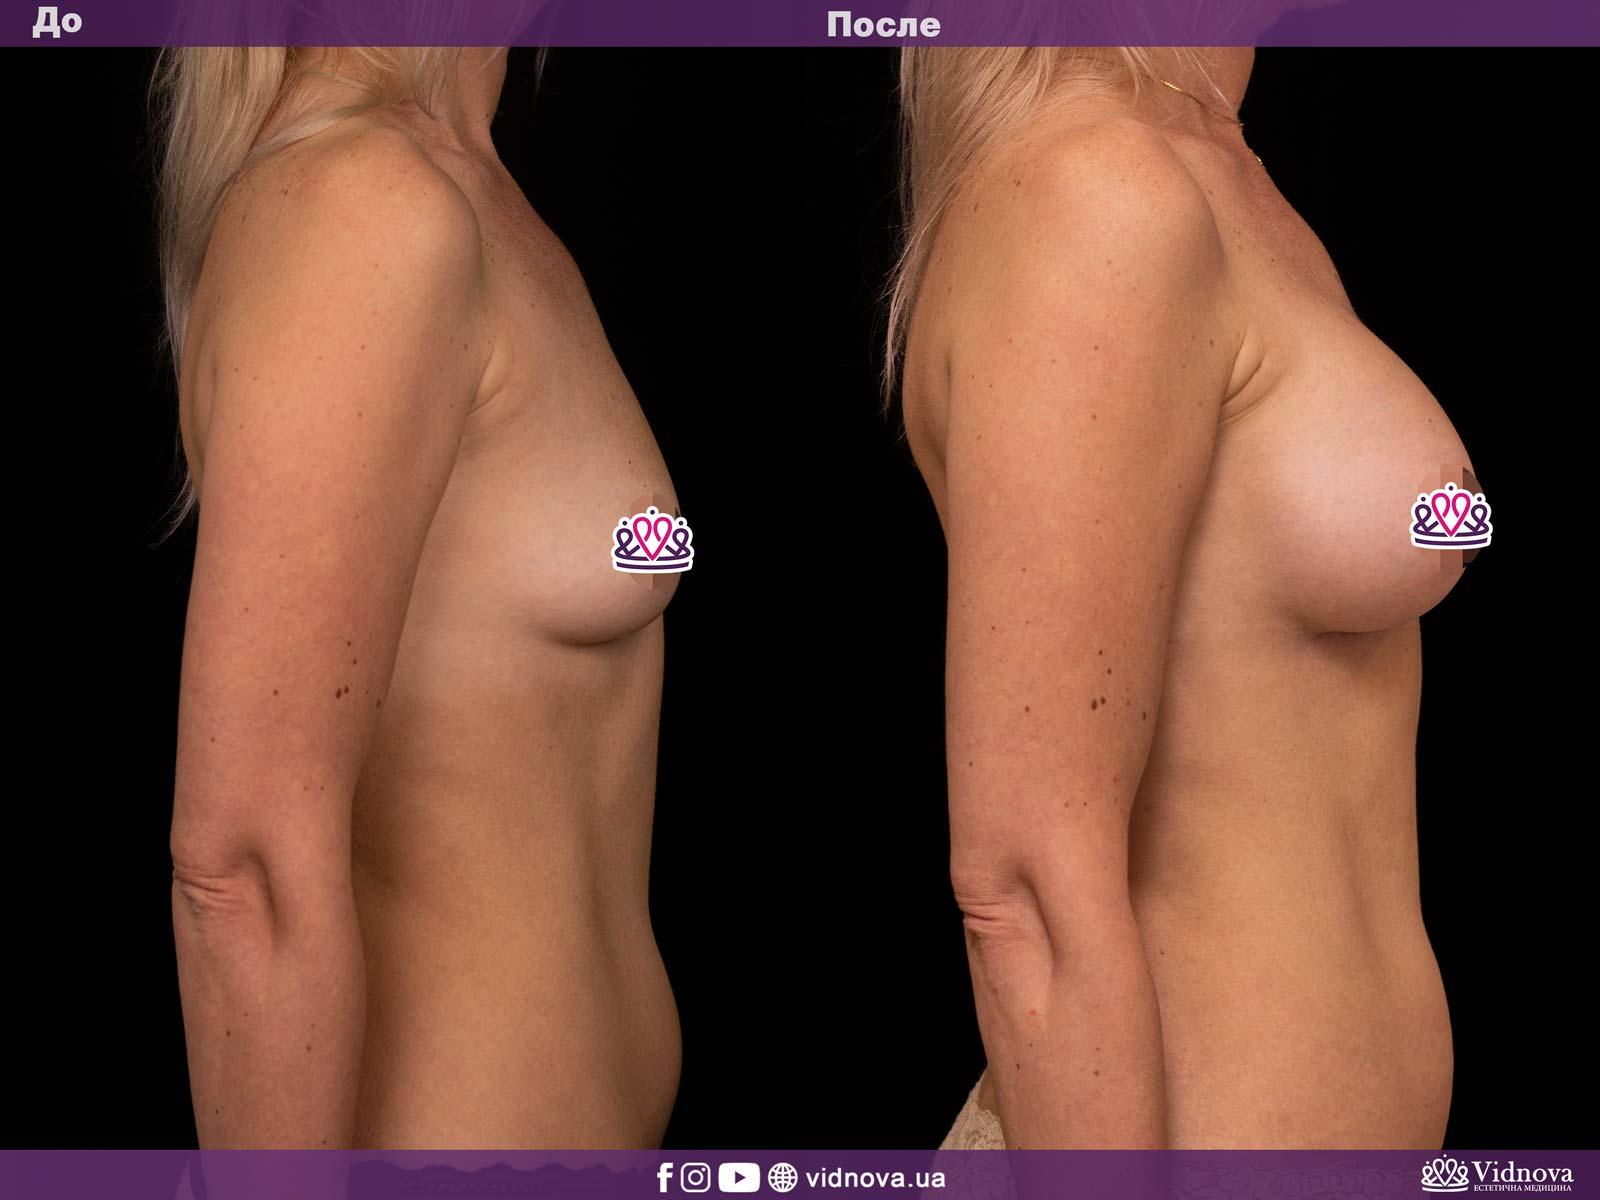 Увеличение груди: Фото ДО и ПОСЛЕ - Пример №6-3 - Клиника Vidnova